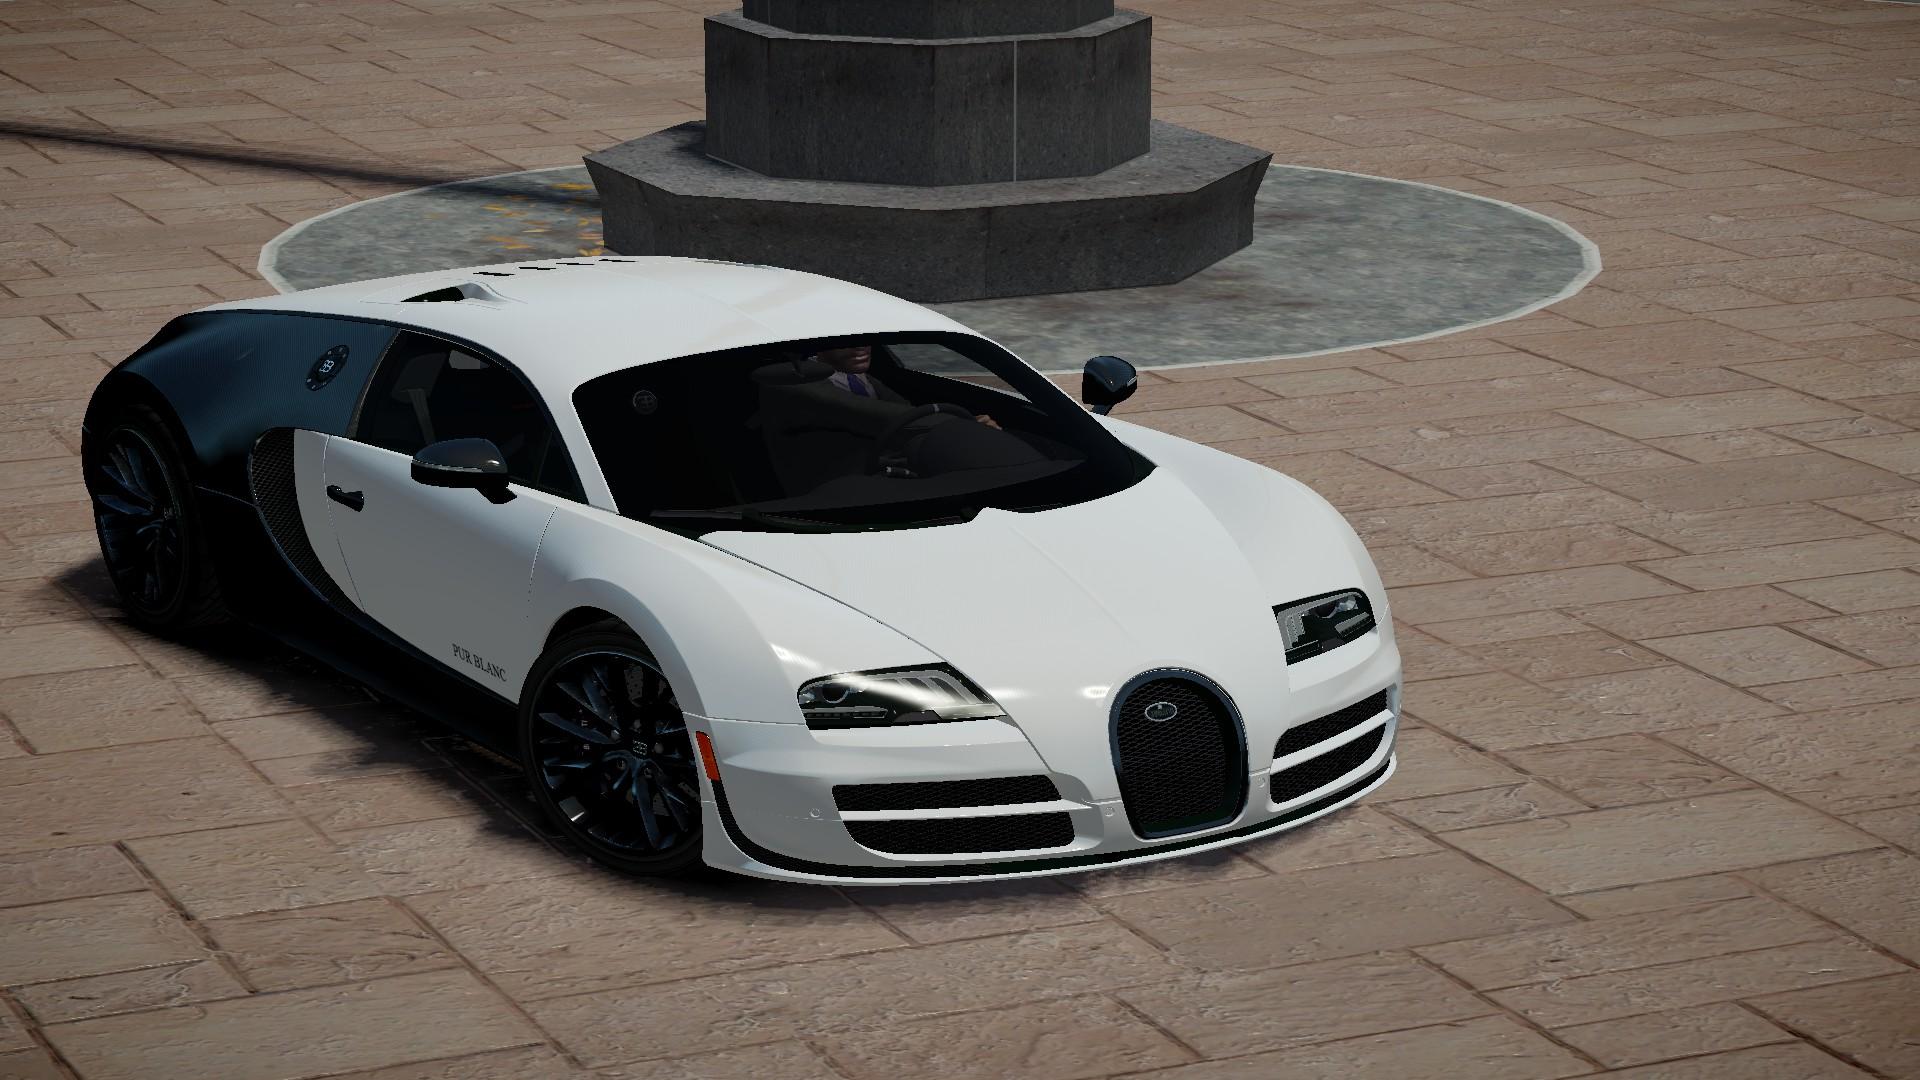 1360603280_2013021100001 Terrific Bugatti Veyron Mod Gta Sa Cars Trend